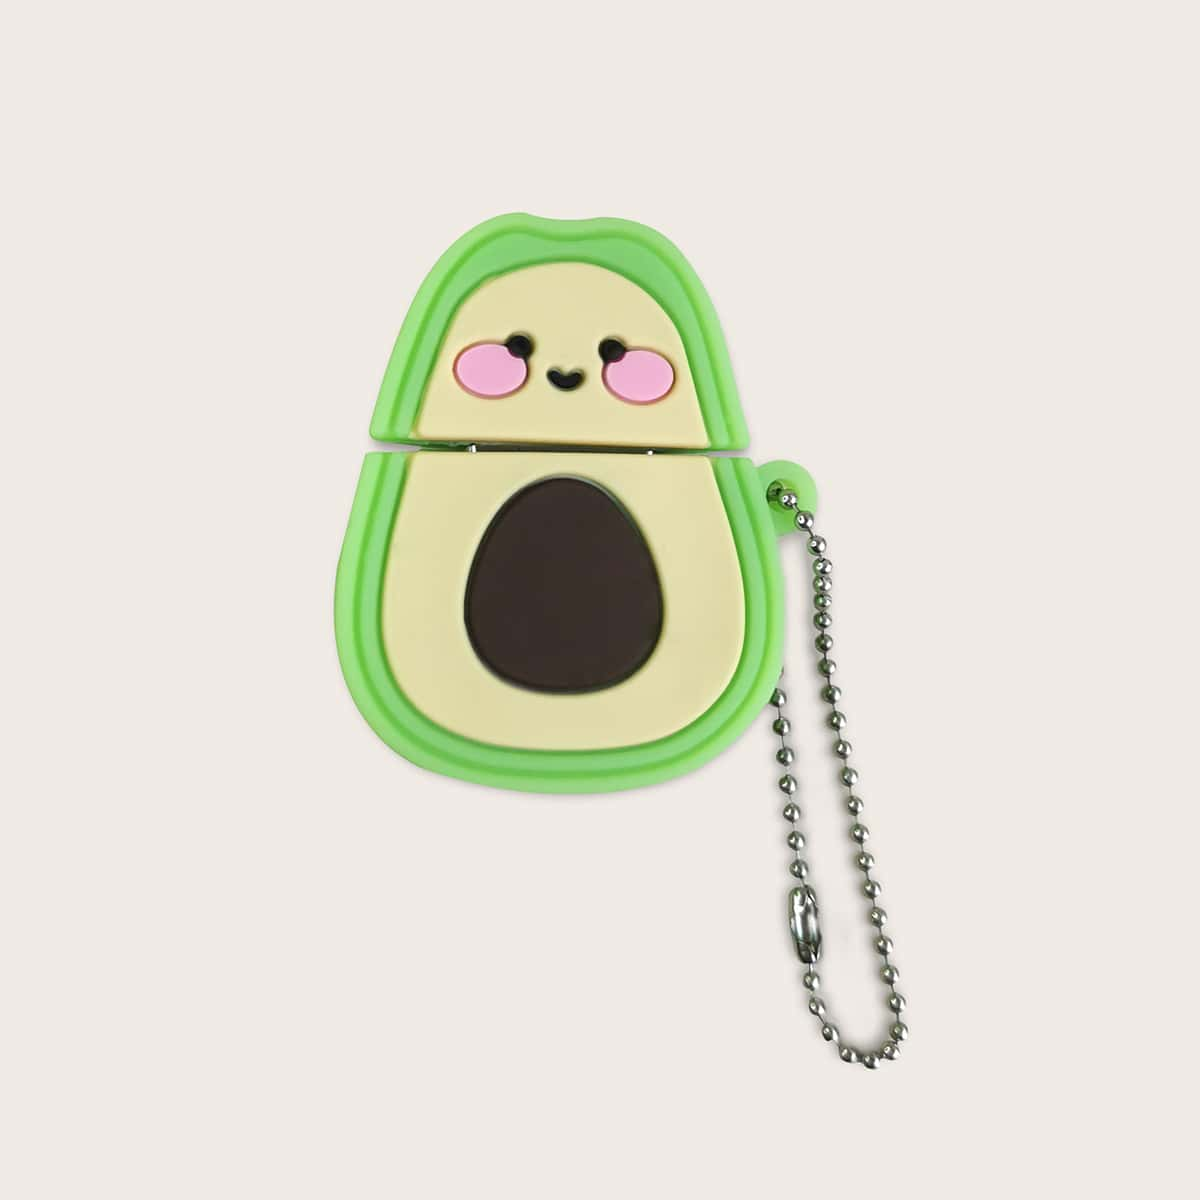 USB-флеш-накопитель в форме авокадо